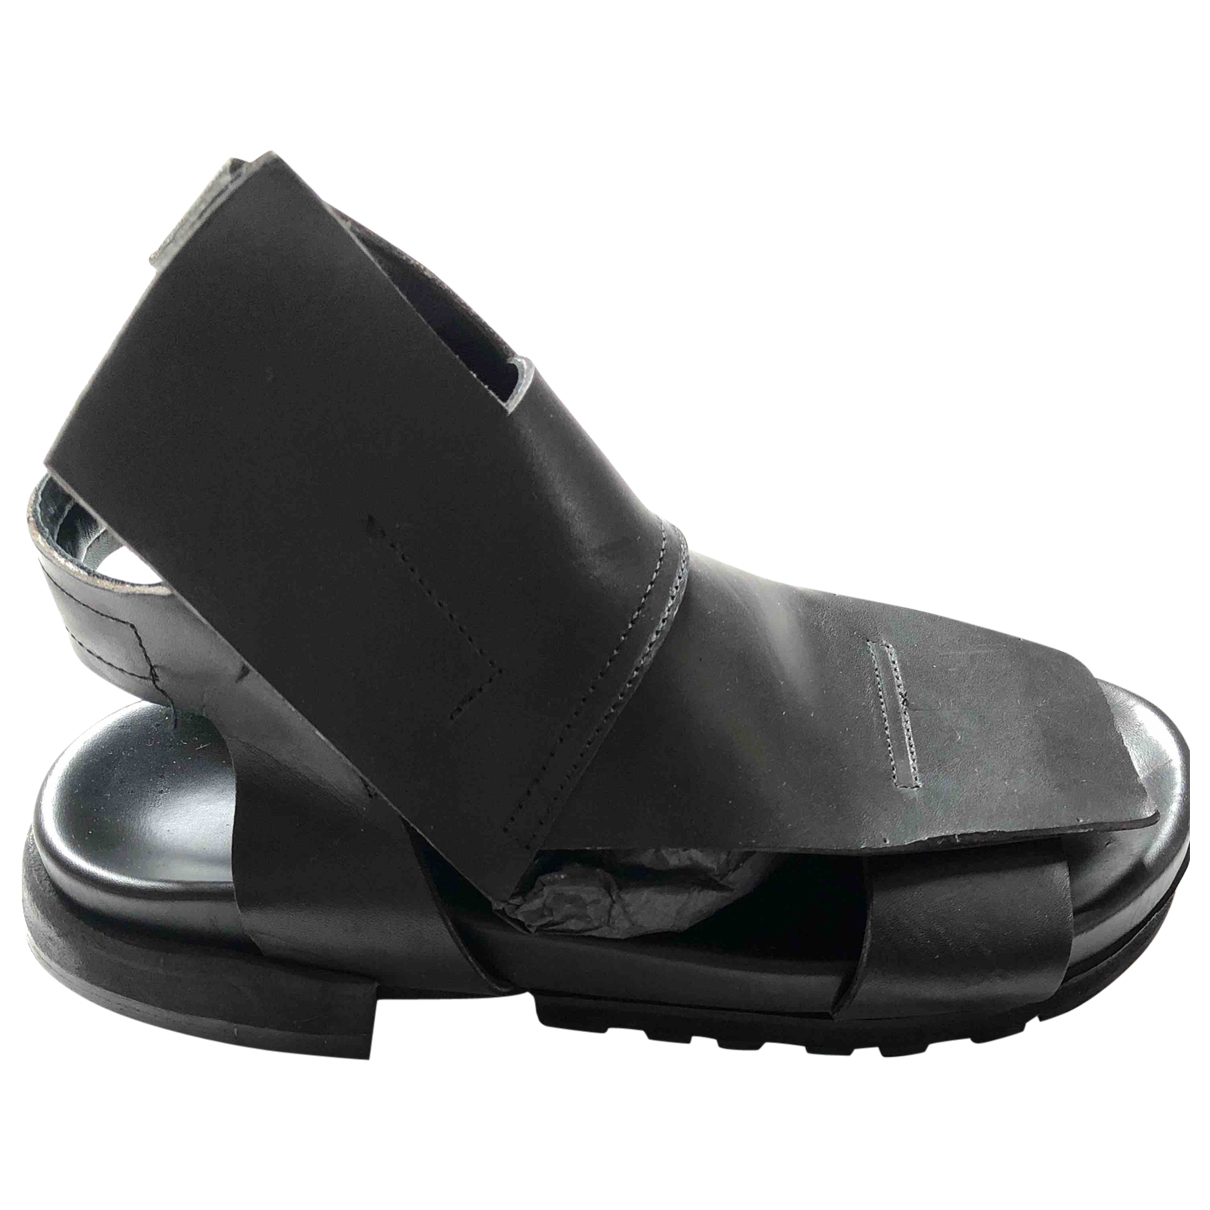 Cinzia Araia \N Black Leather Sandals for Women 40 EU